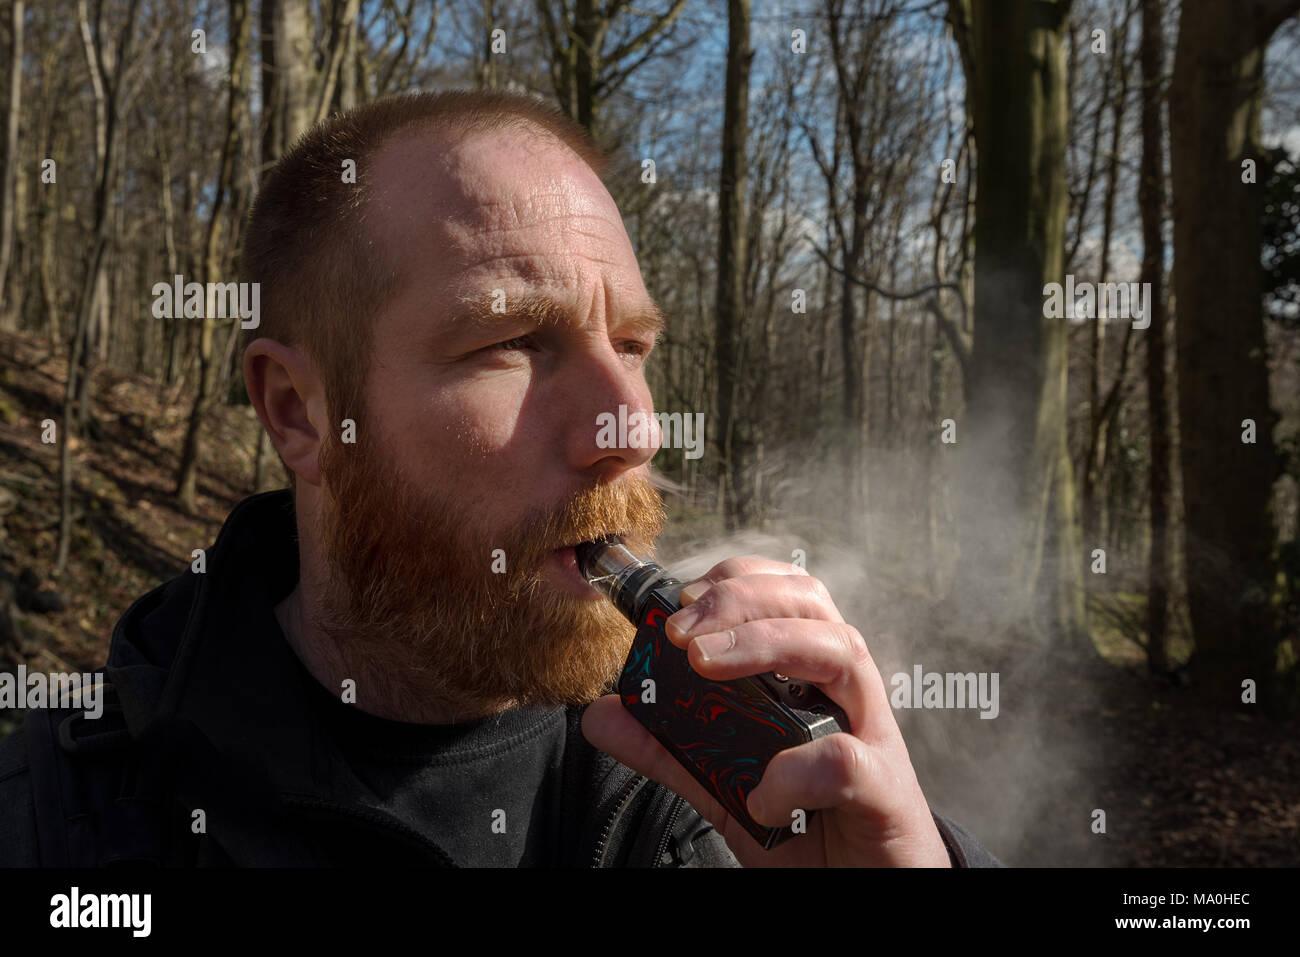 A ginger bearded man vapes on a box mod with glass vaporiser. - Stock Image